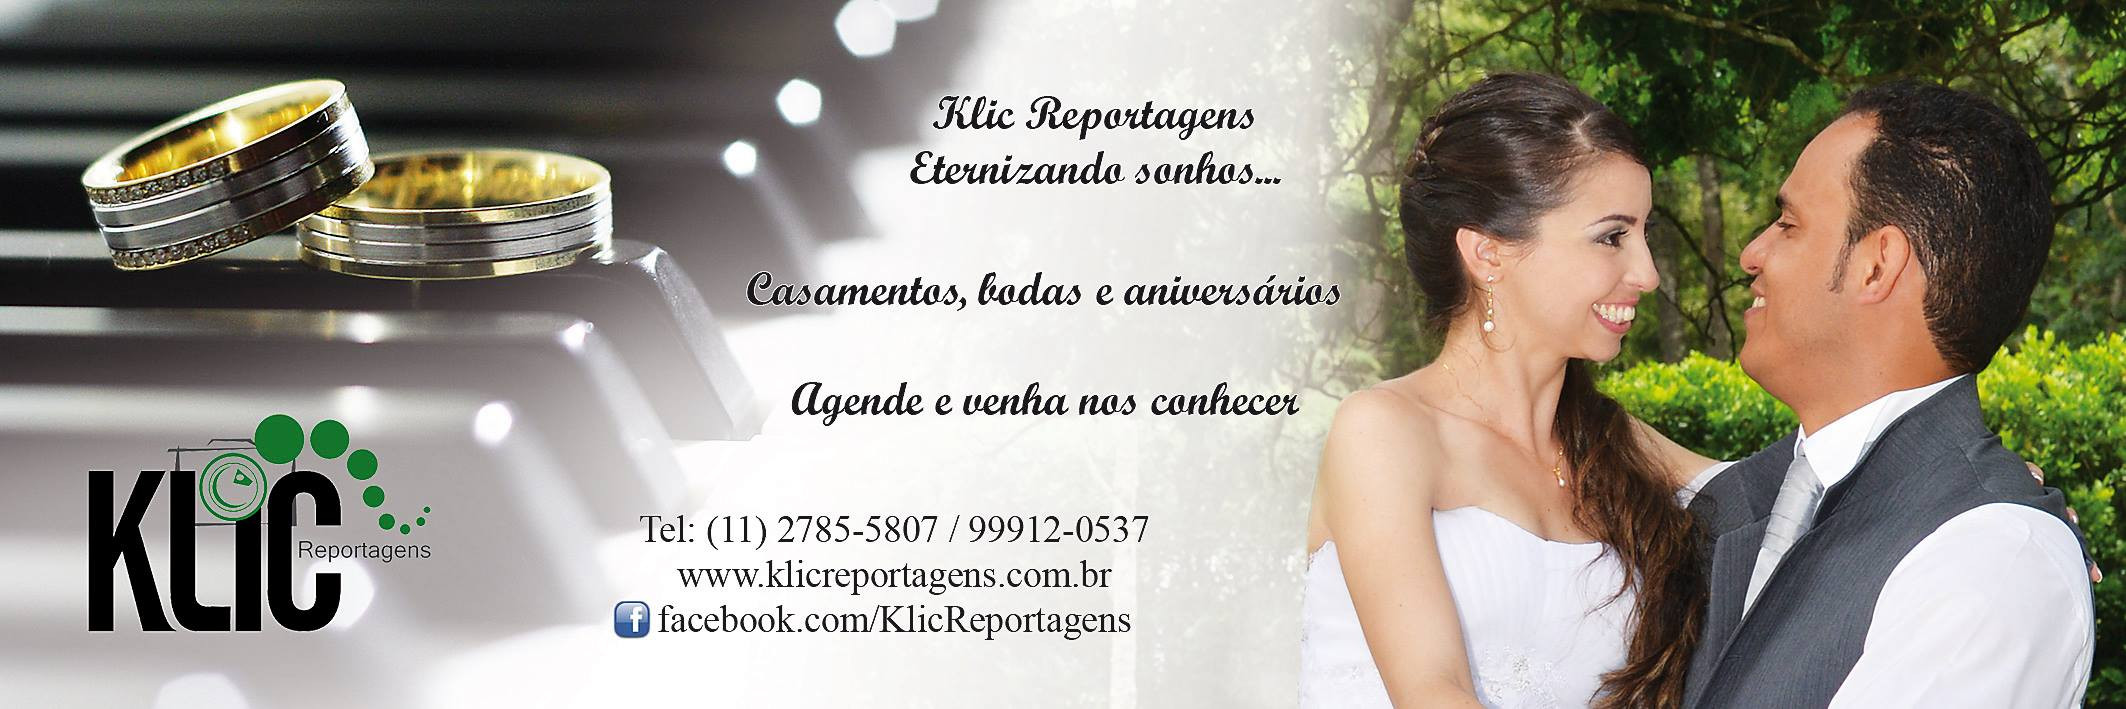 (c) Klicreportagens.com.br